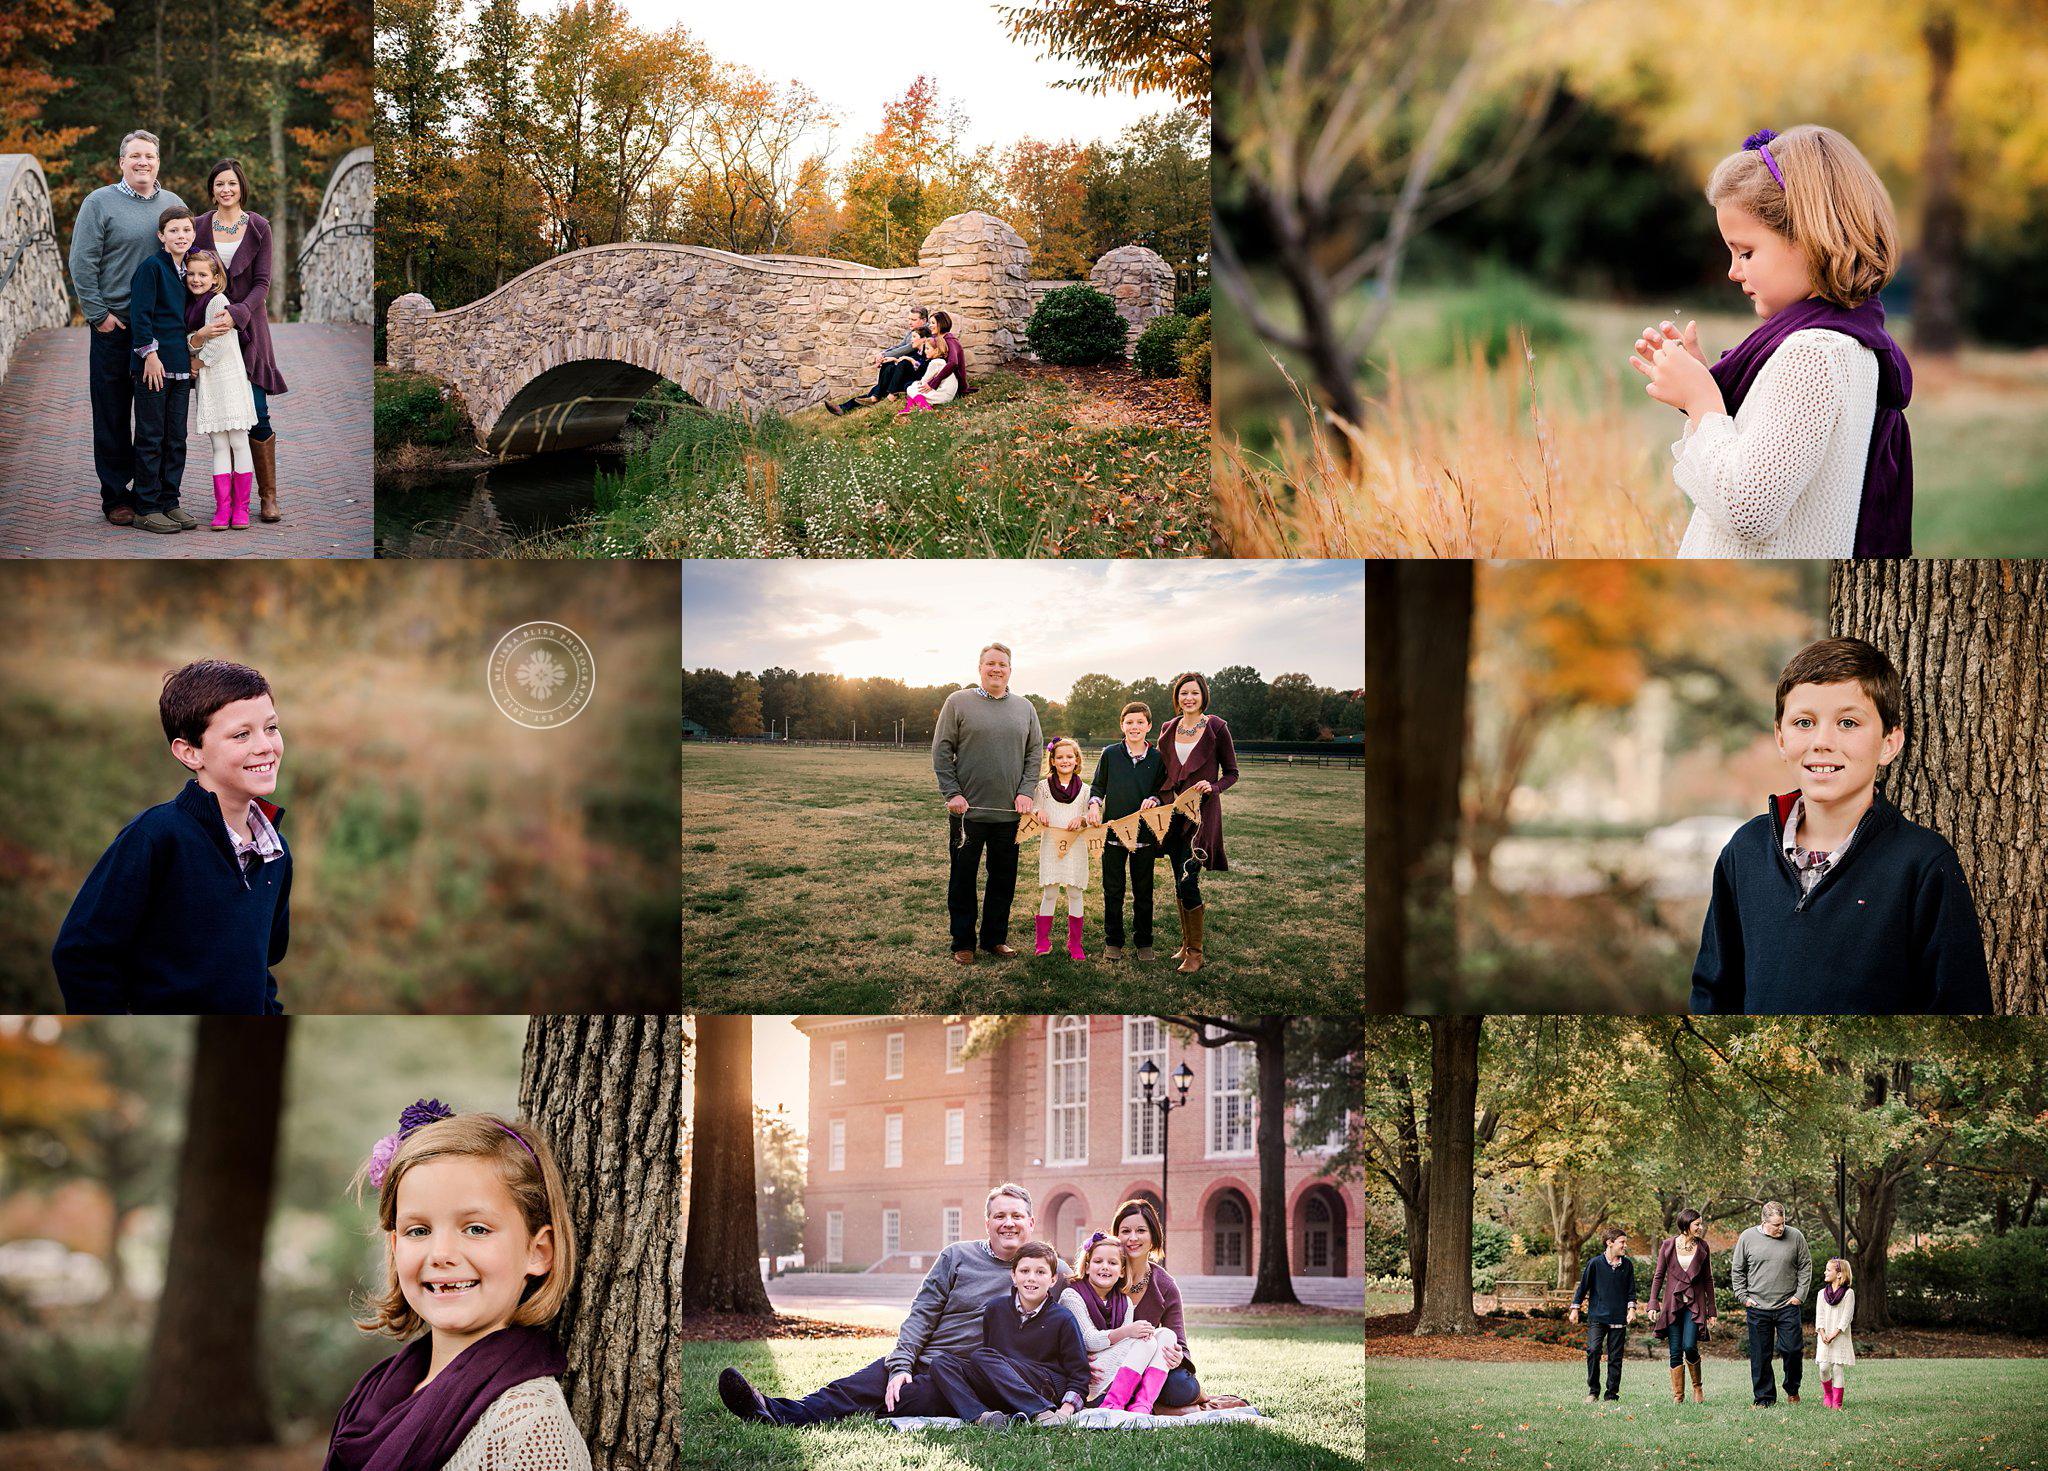 fall-portrait-session-family-lifestyle-photographer-melissa-bliss-photography-virginia-beach-norfolk-chesapeake-suffolk-hampton-roads-va-photographers